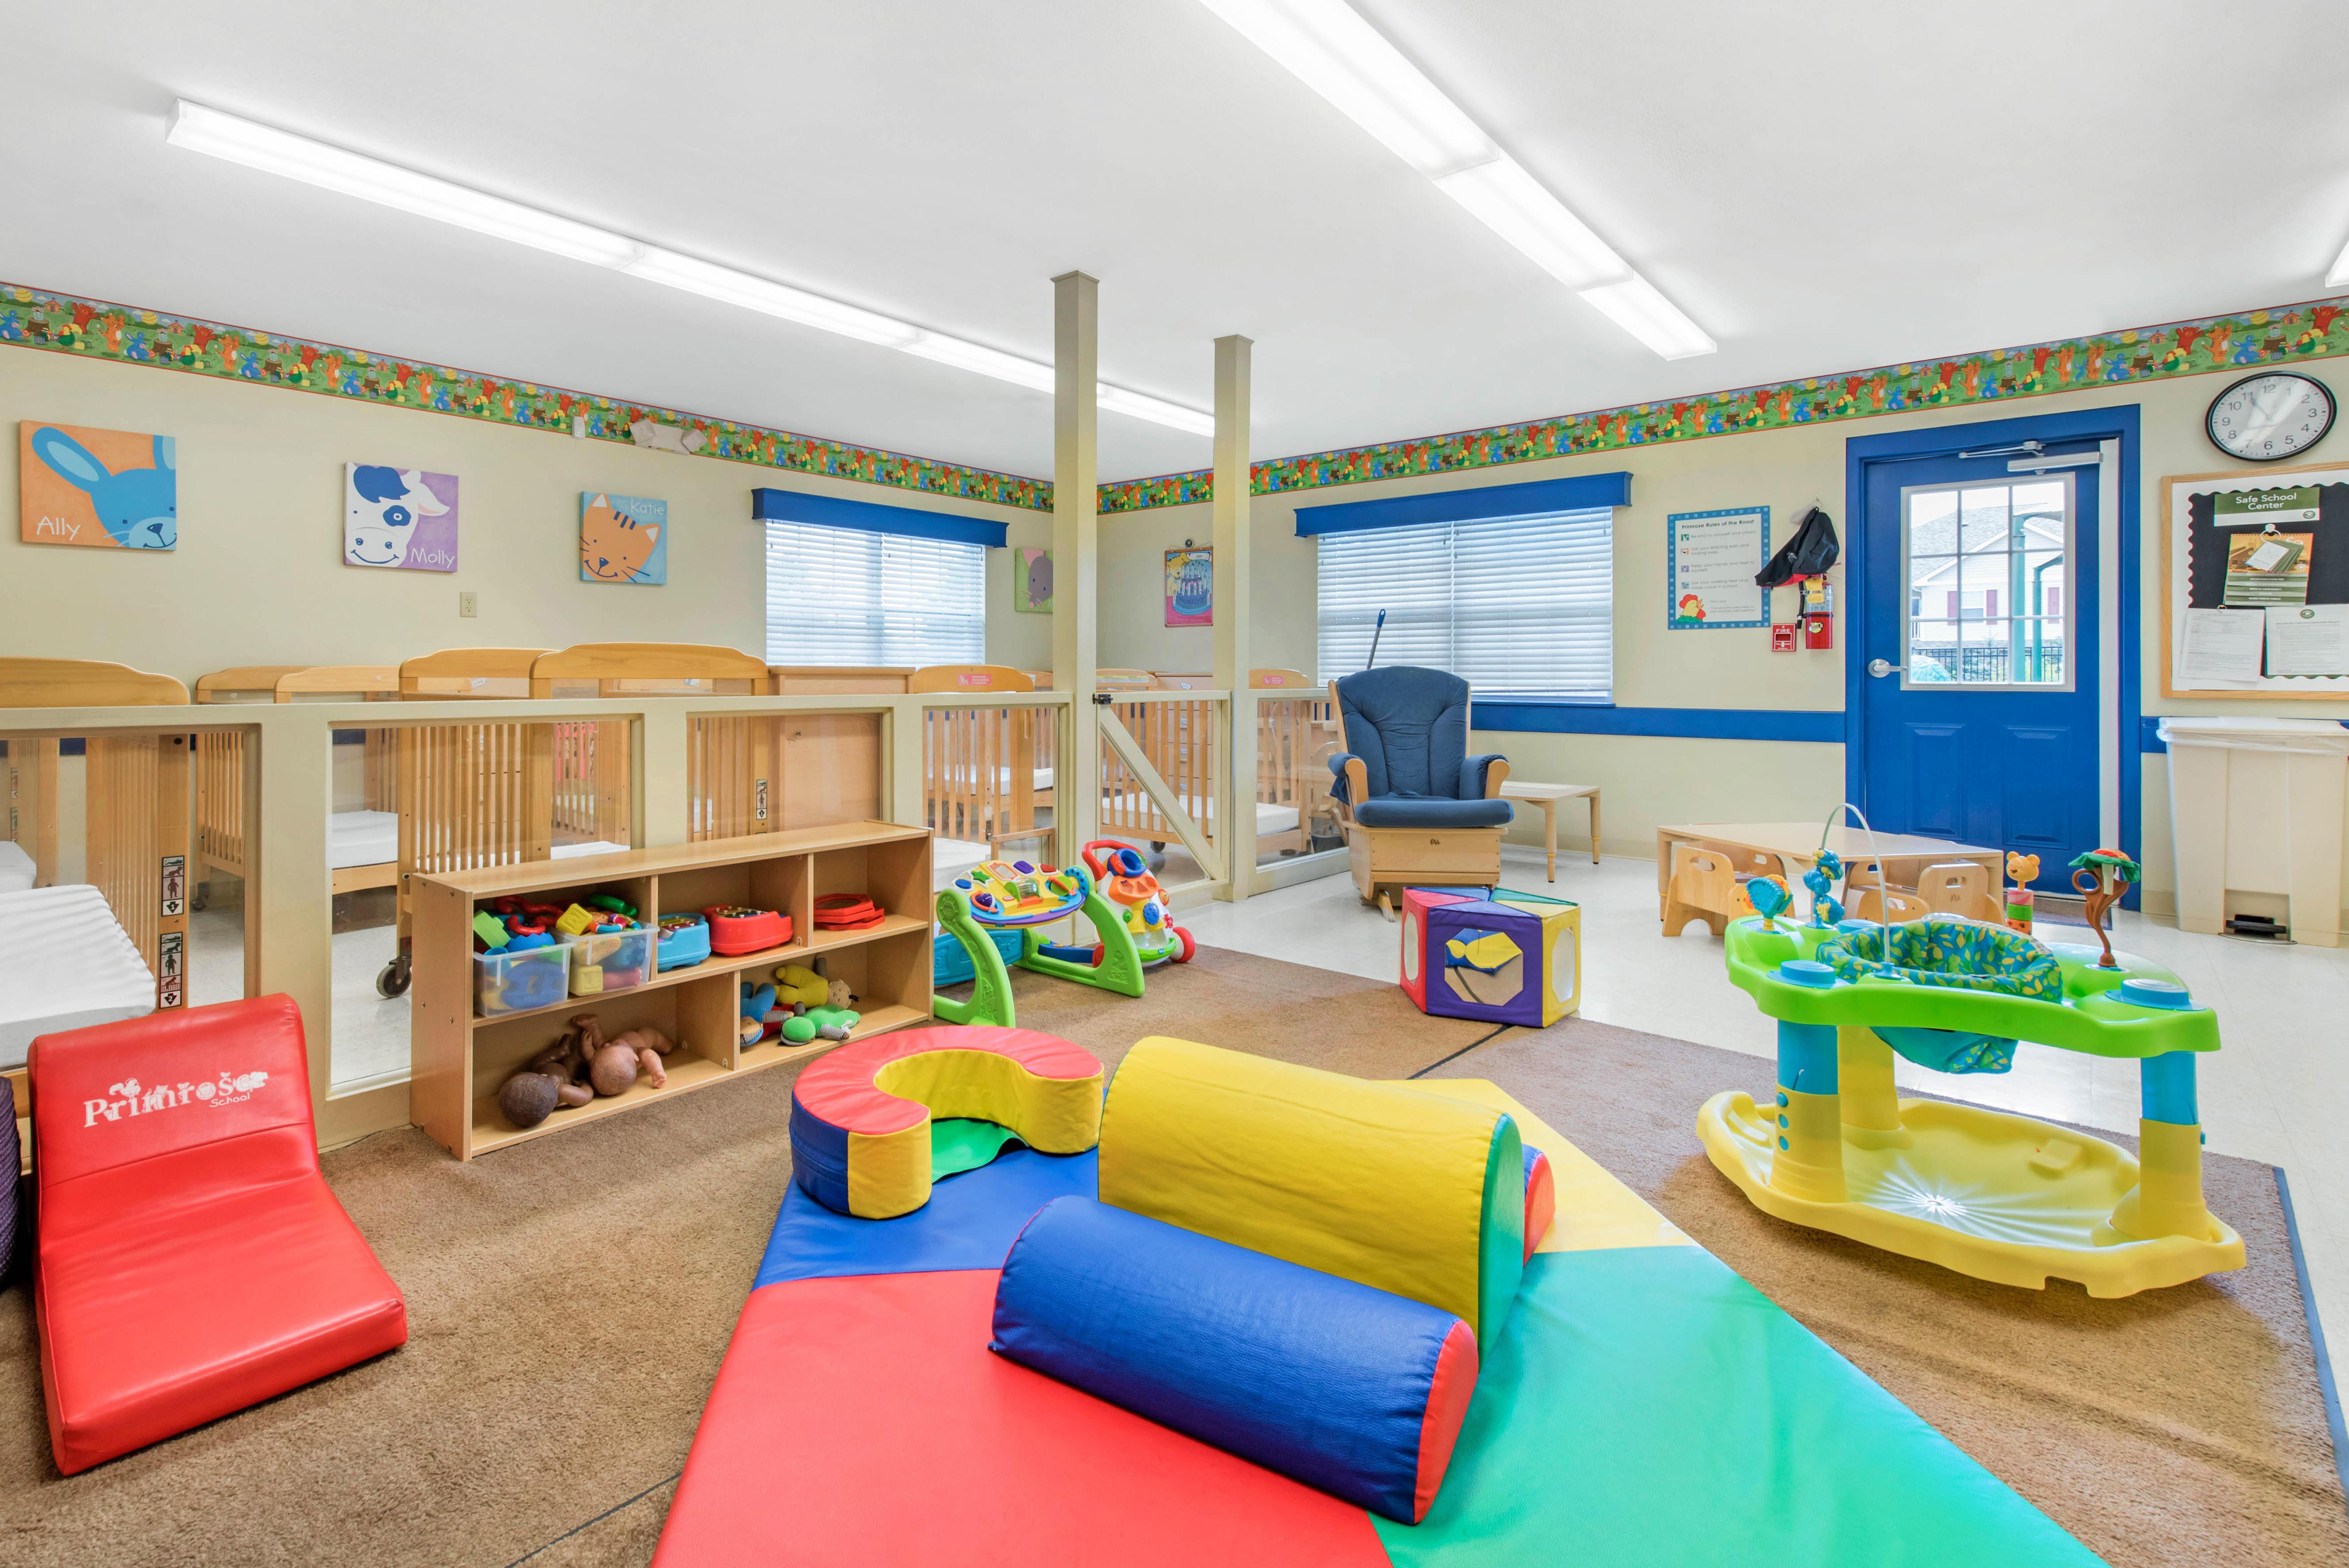 Primrose School at Pinnacle image 3